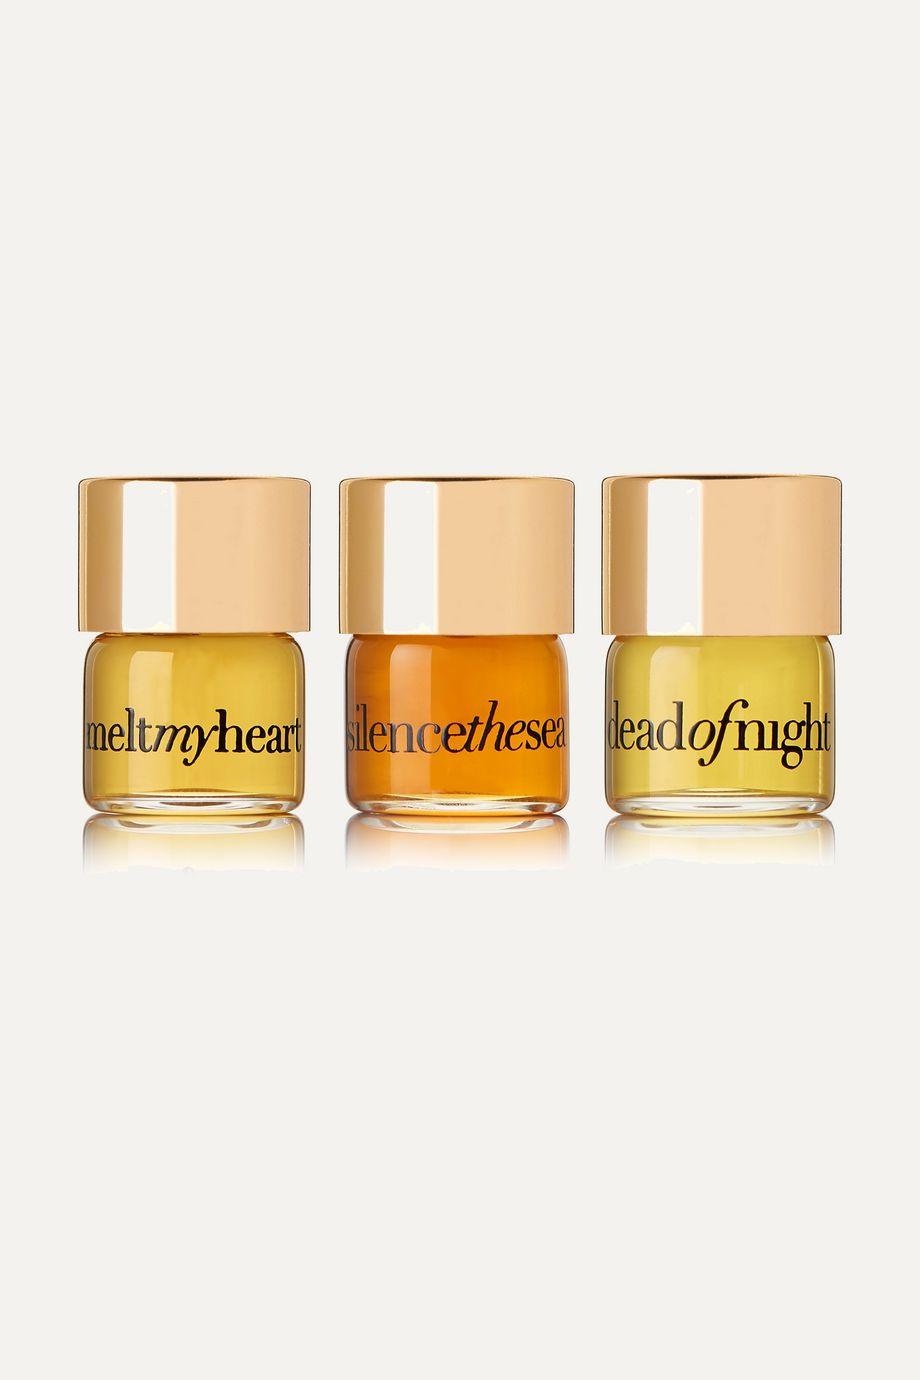 strangelove nyc Perfume Oil Travel Set, 3 x 1.25ml